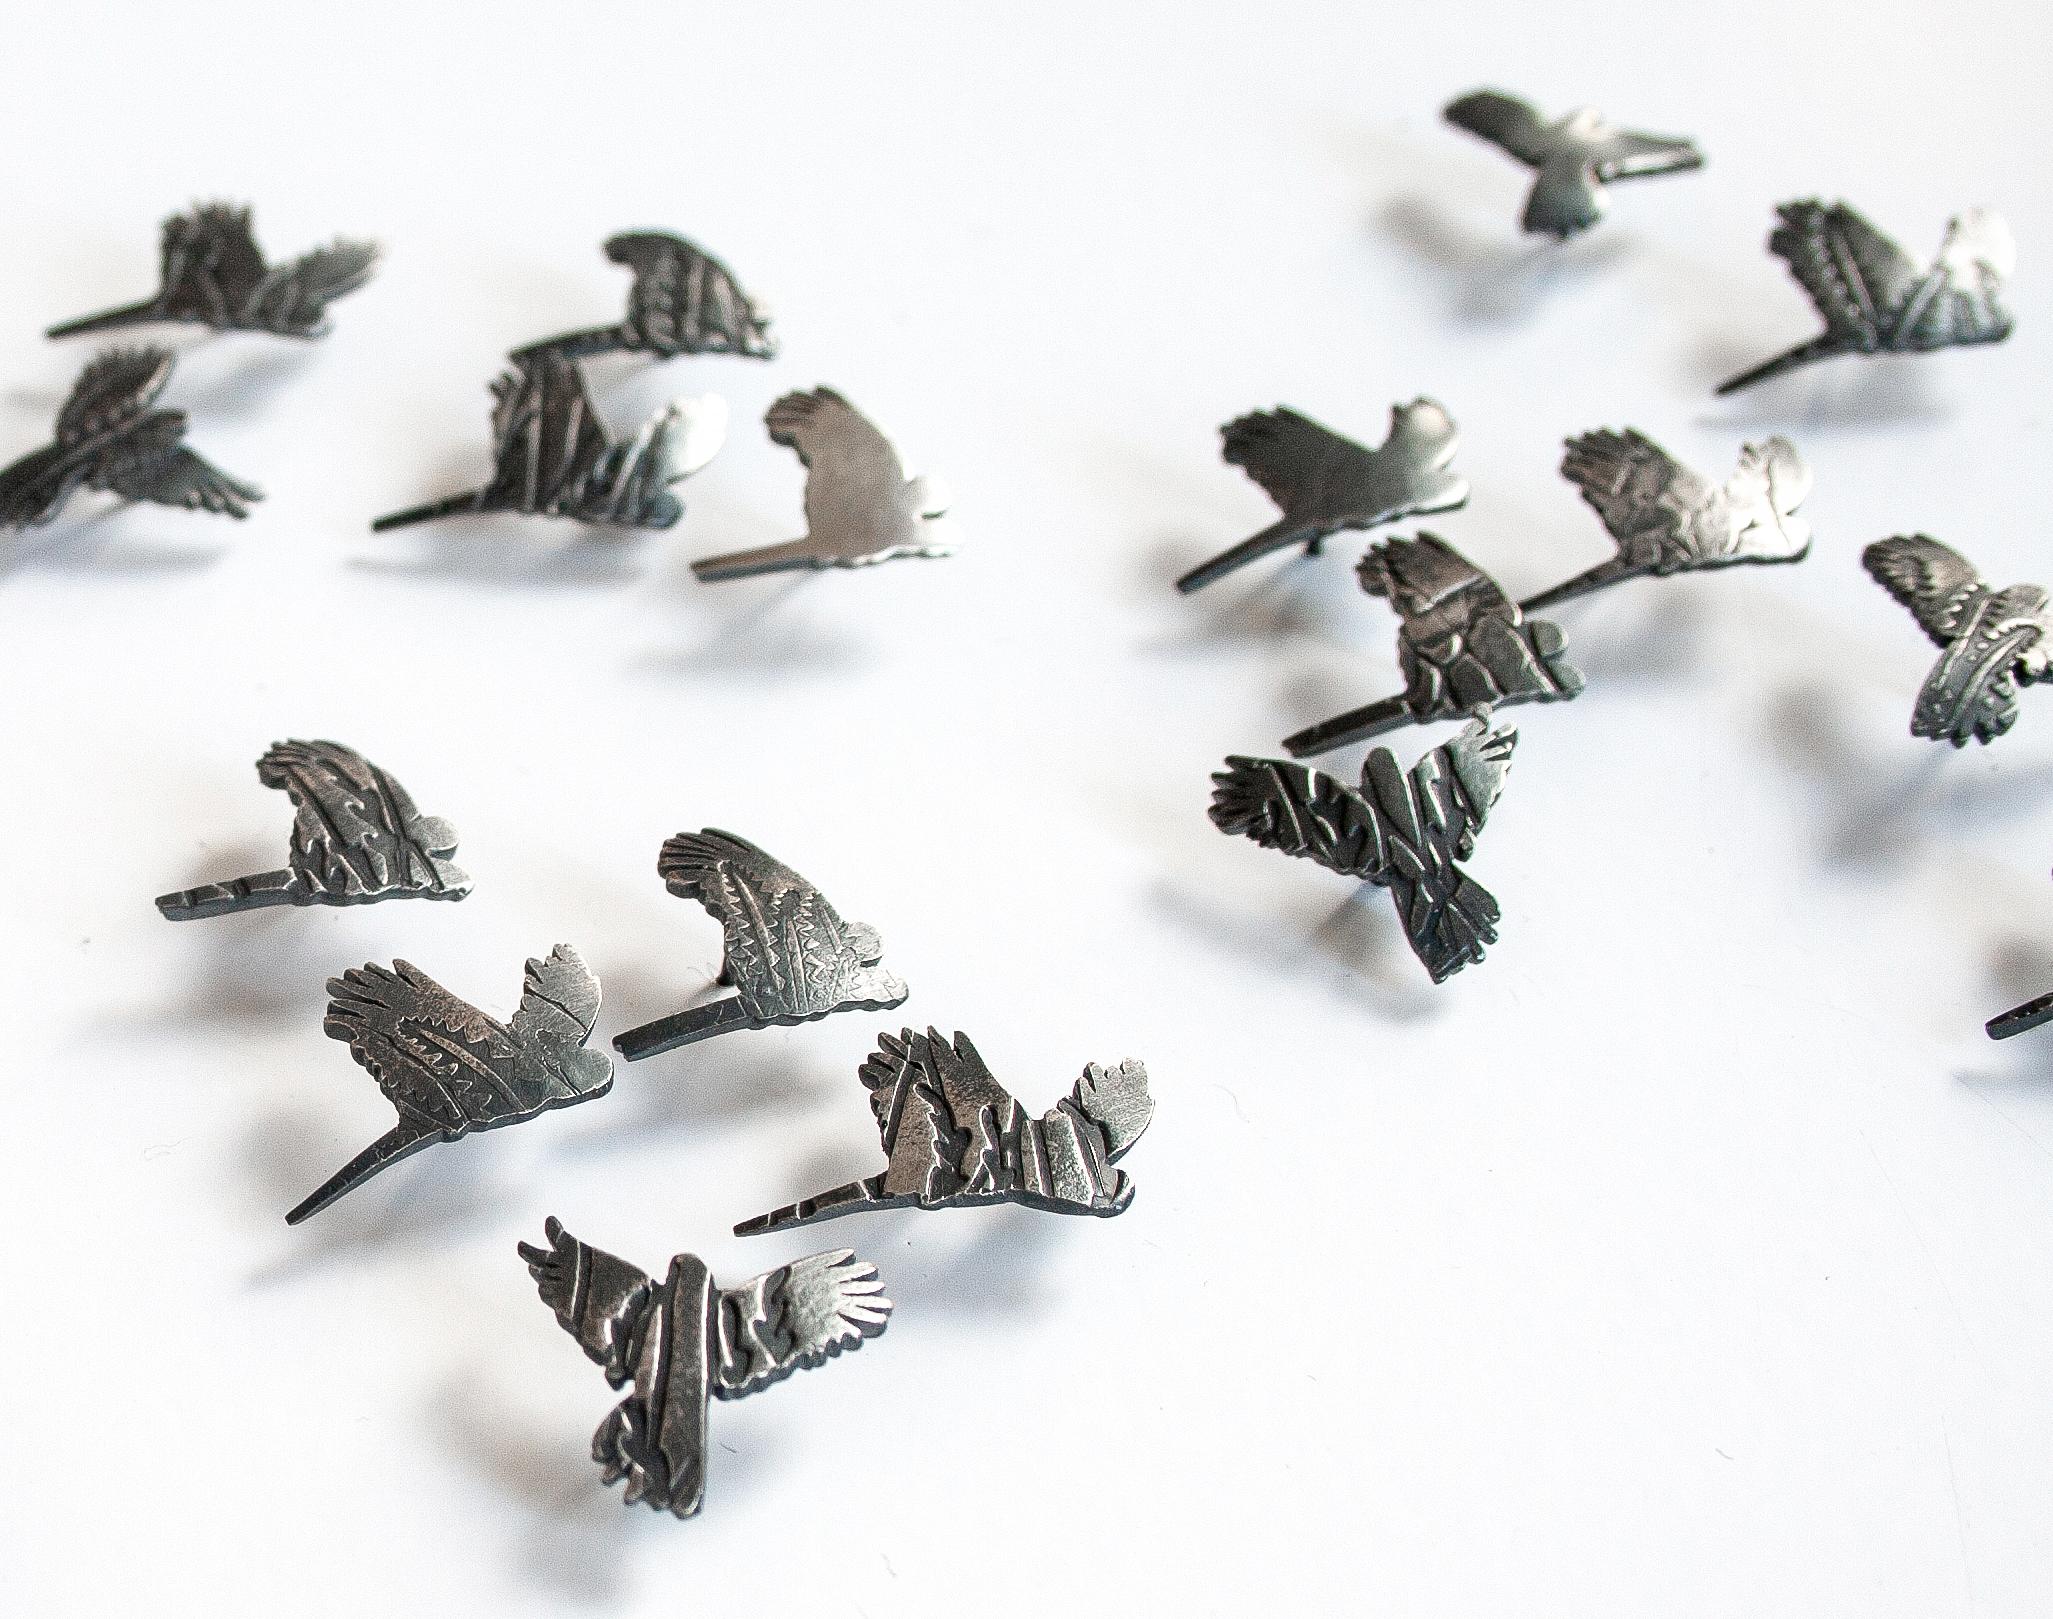 5.-robin-wells-escape-brooch-pins-detail-2.jpg